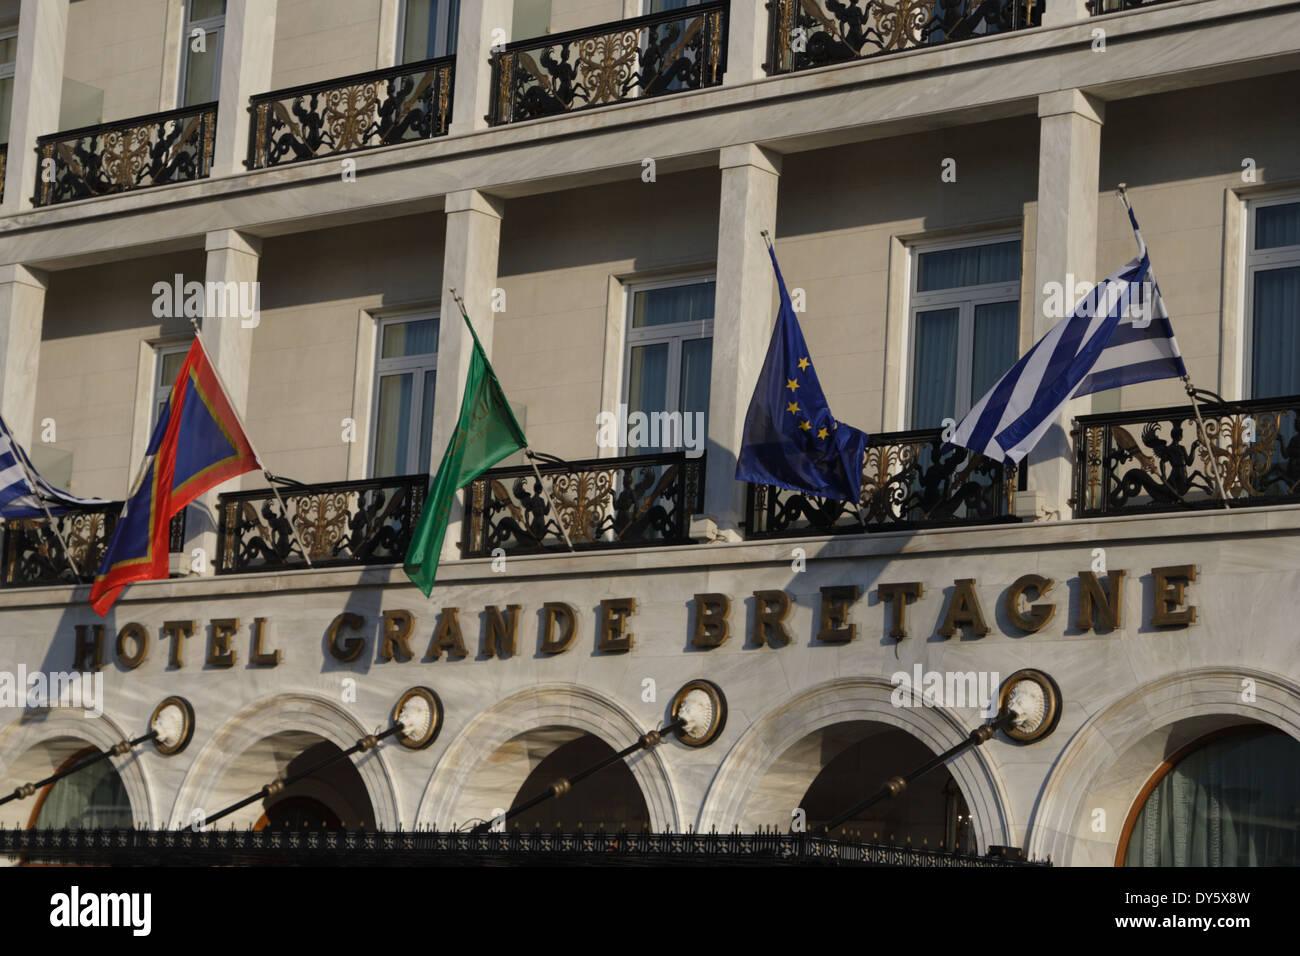 Facade of the Hotel Grande Bretagne, Athens, Greece - Stock Image